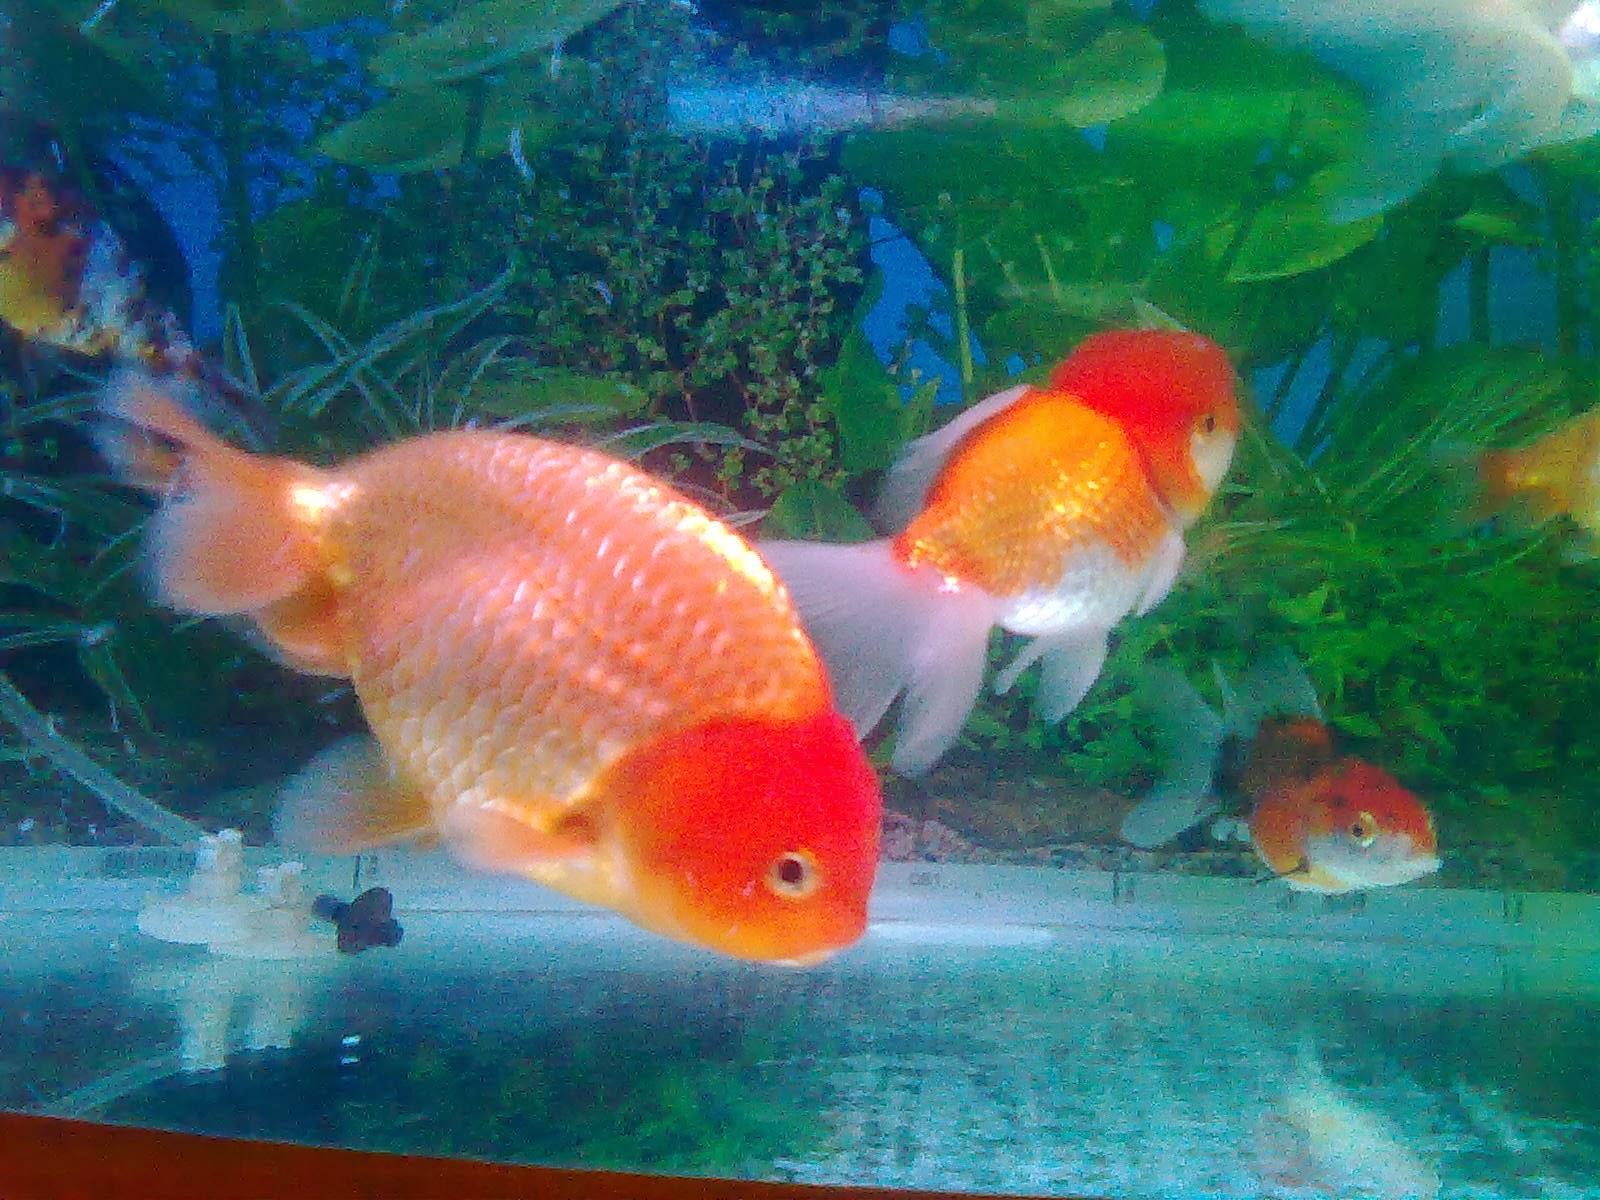 Ikan+koi fishshare.blogspot ikan+hias+(112a)